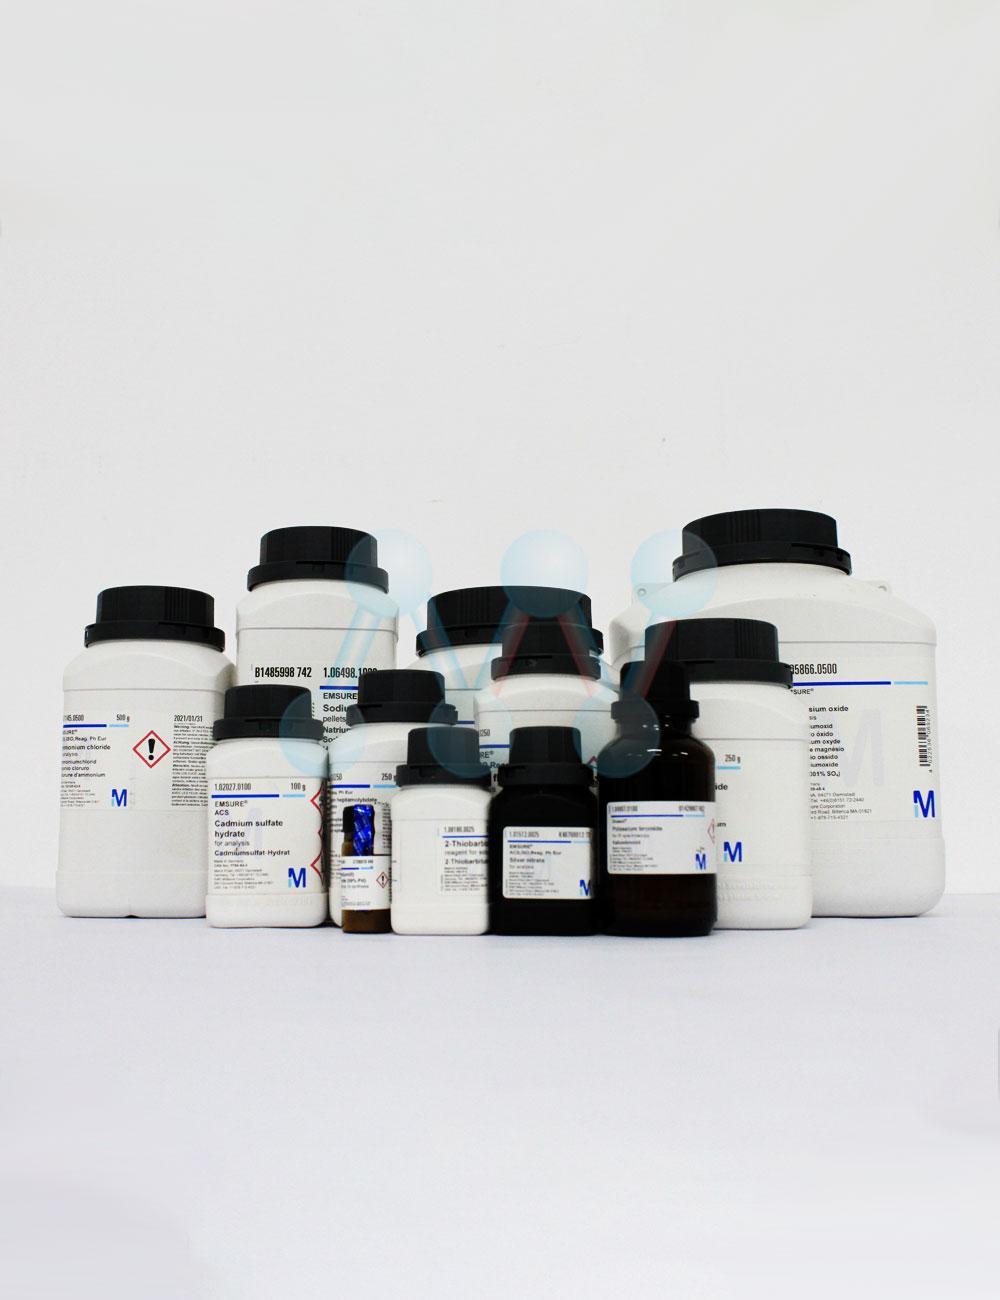 Sodium molybdate dihydrate Na2MoO4.2H2O